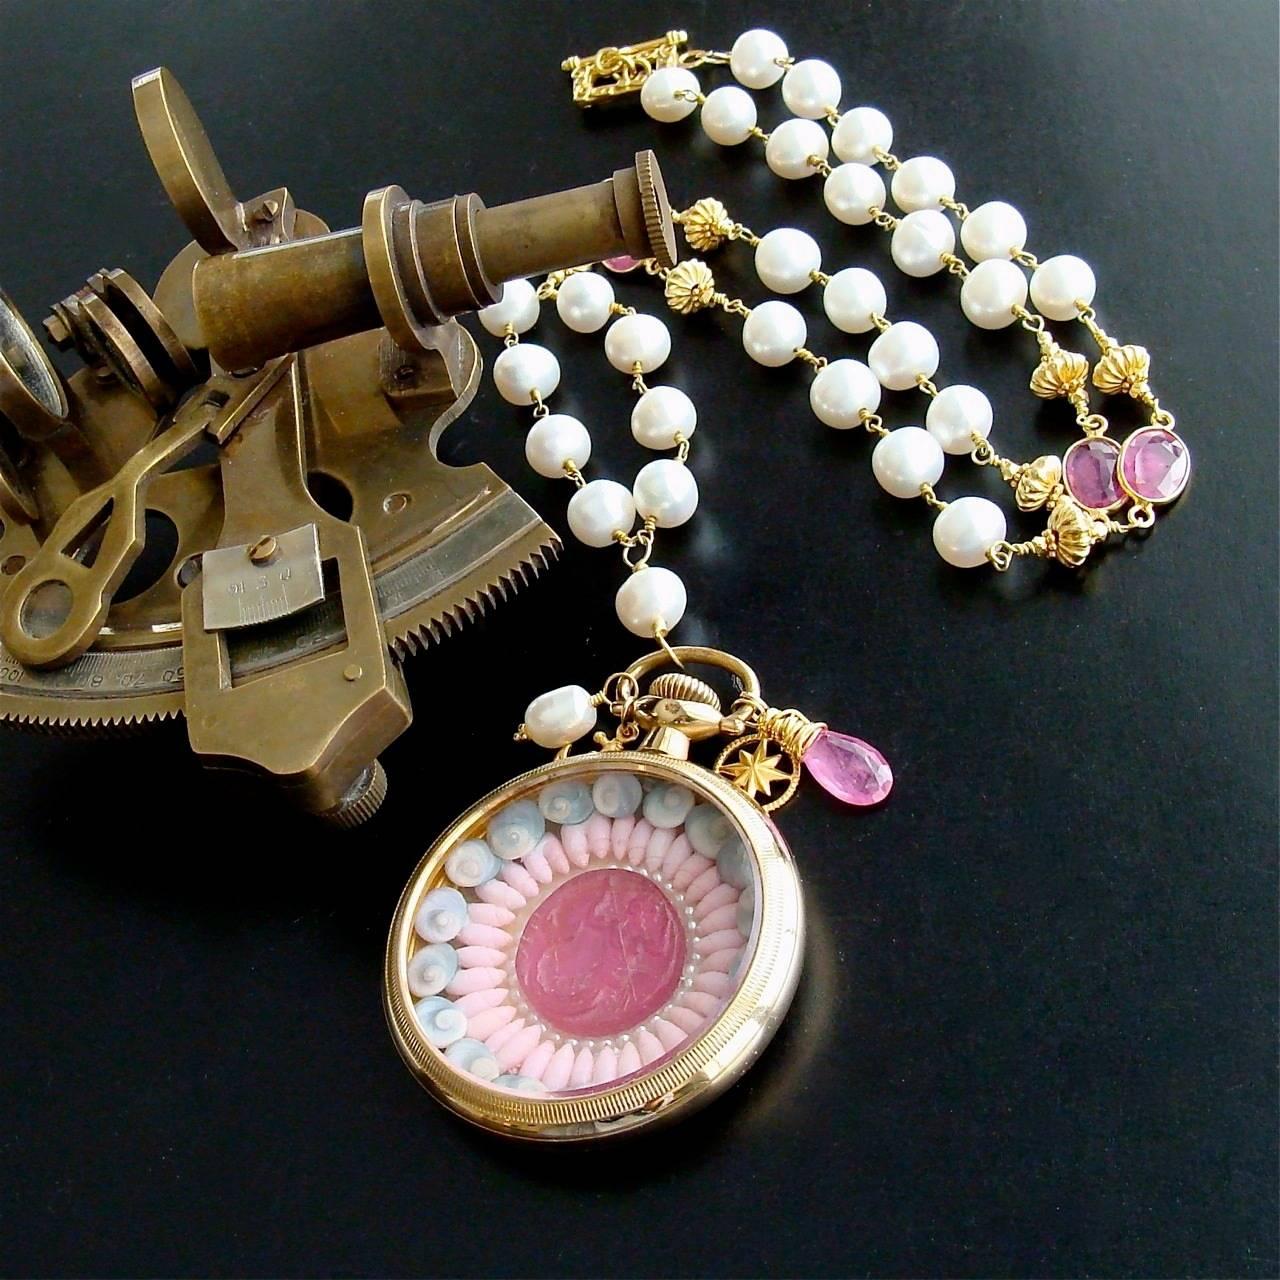 Sailor's Valentine Pocket Watch Pink Sapphire Pearls Necklace 2